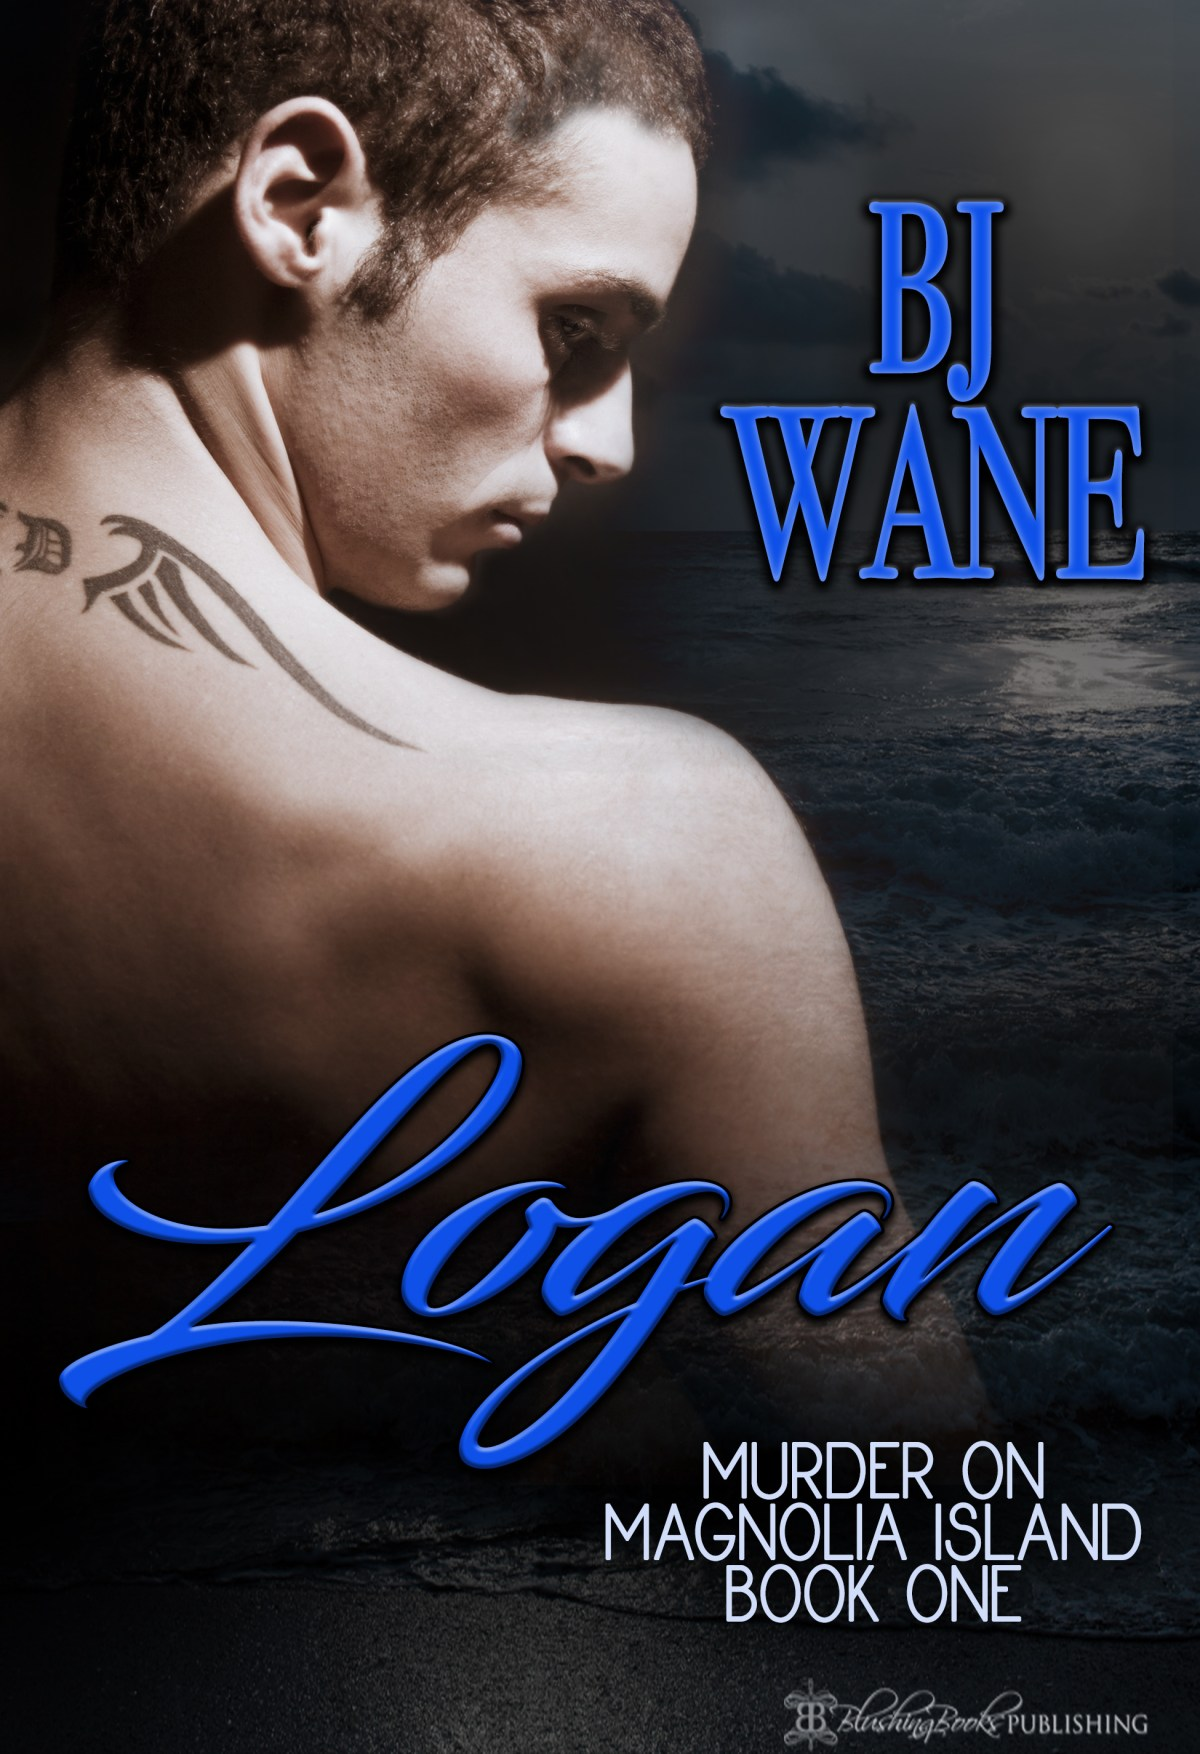 Logan, Murder on Magnolia Island.